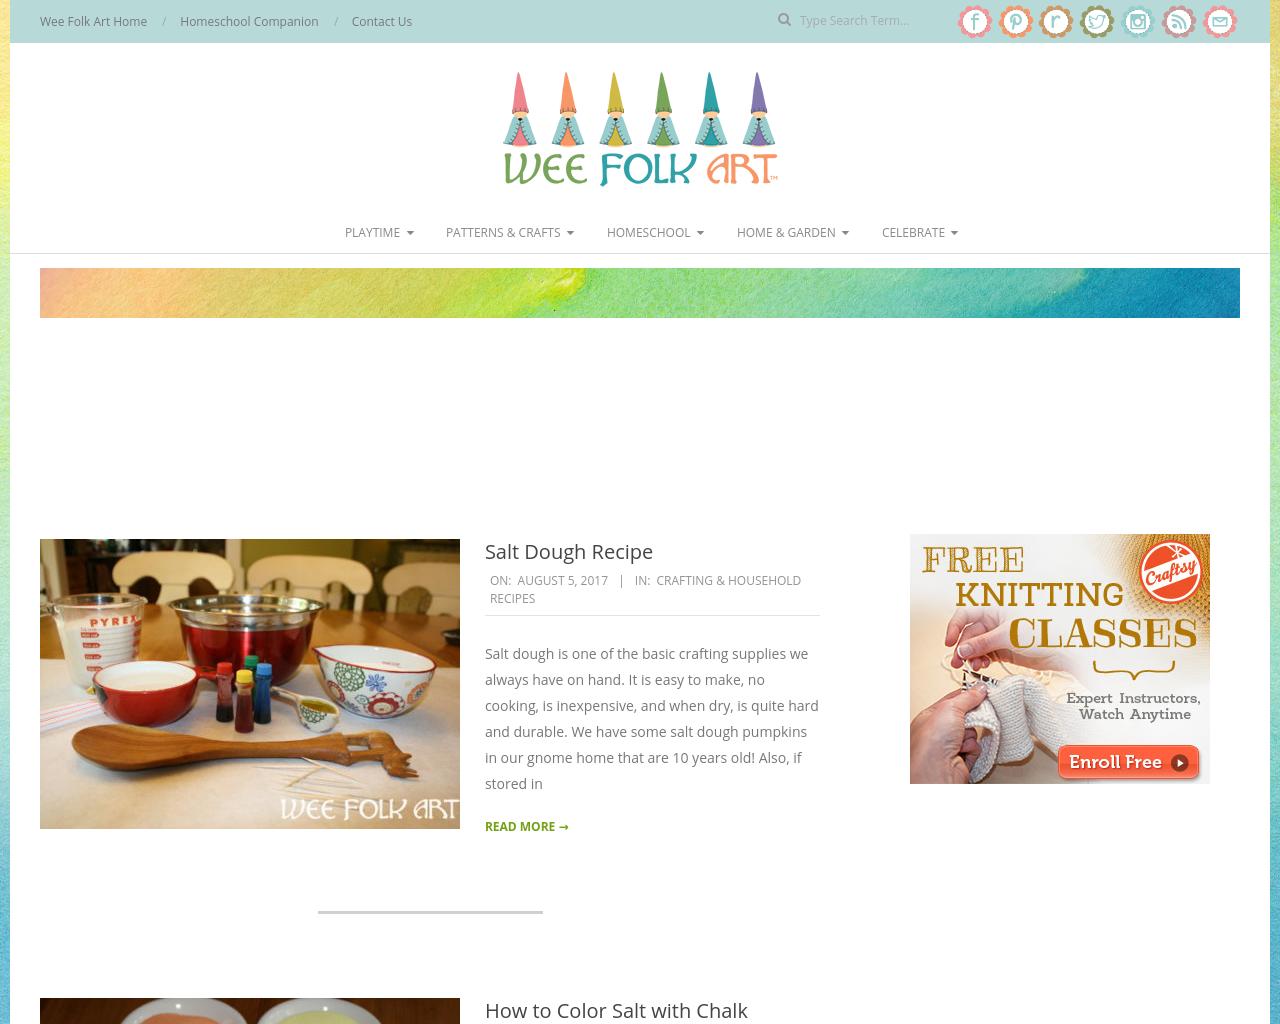 Wee-Folk-Art-Advertising-Reviews-Pricing